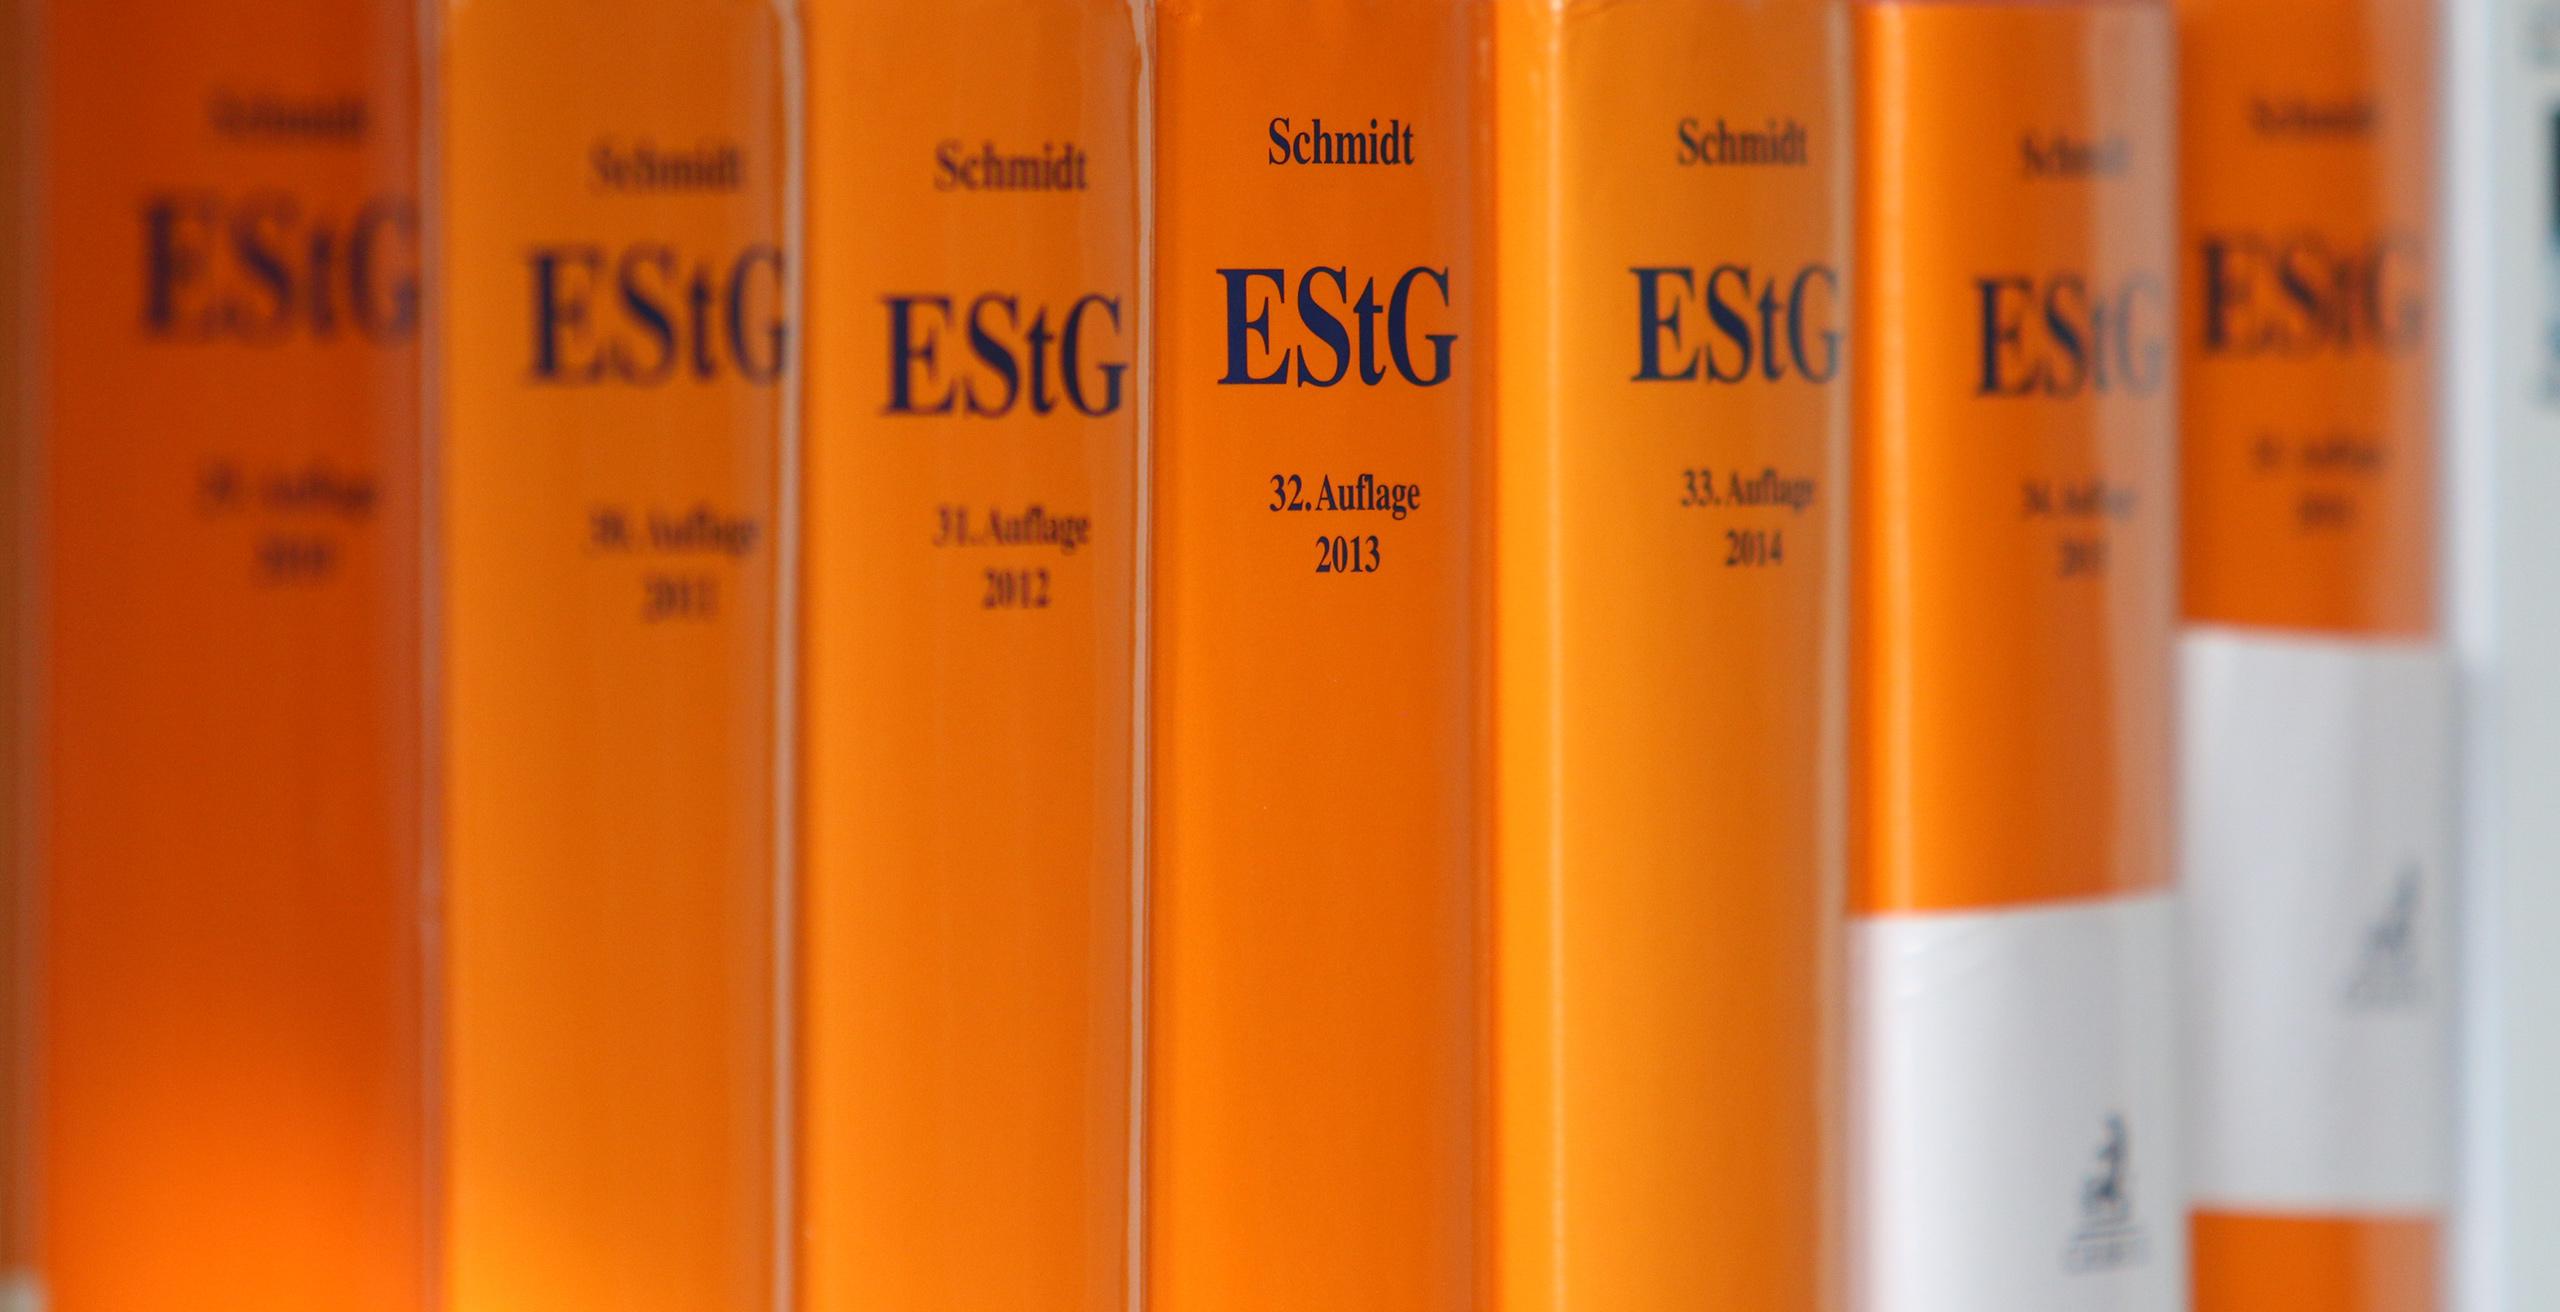 EStG Bücher